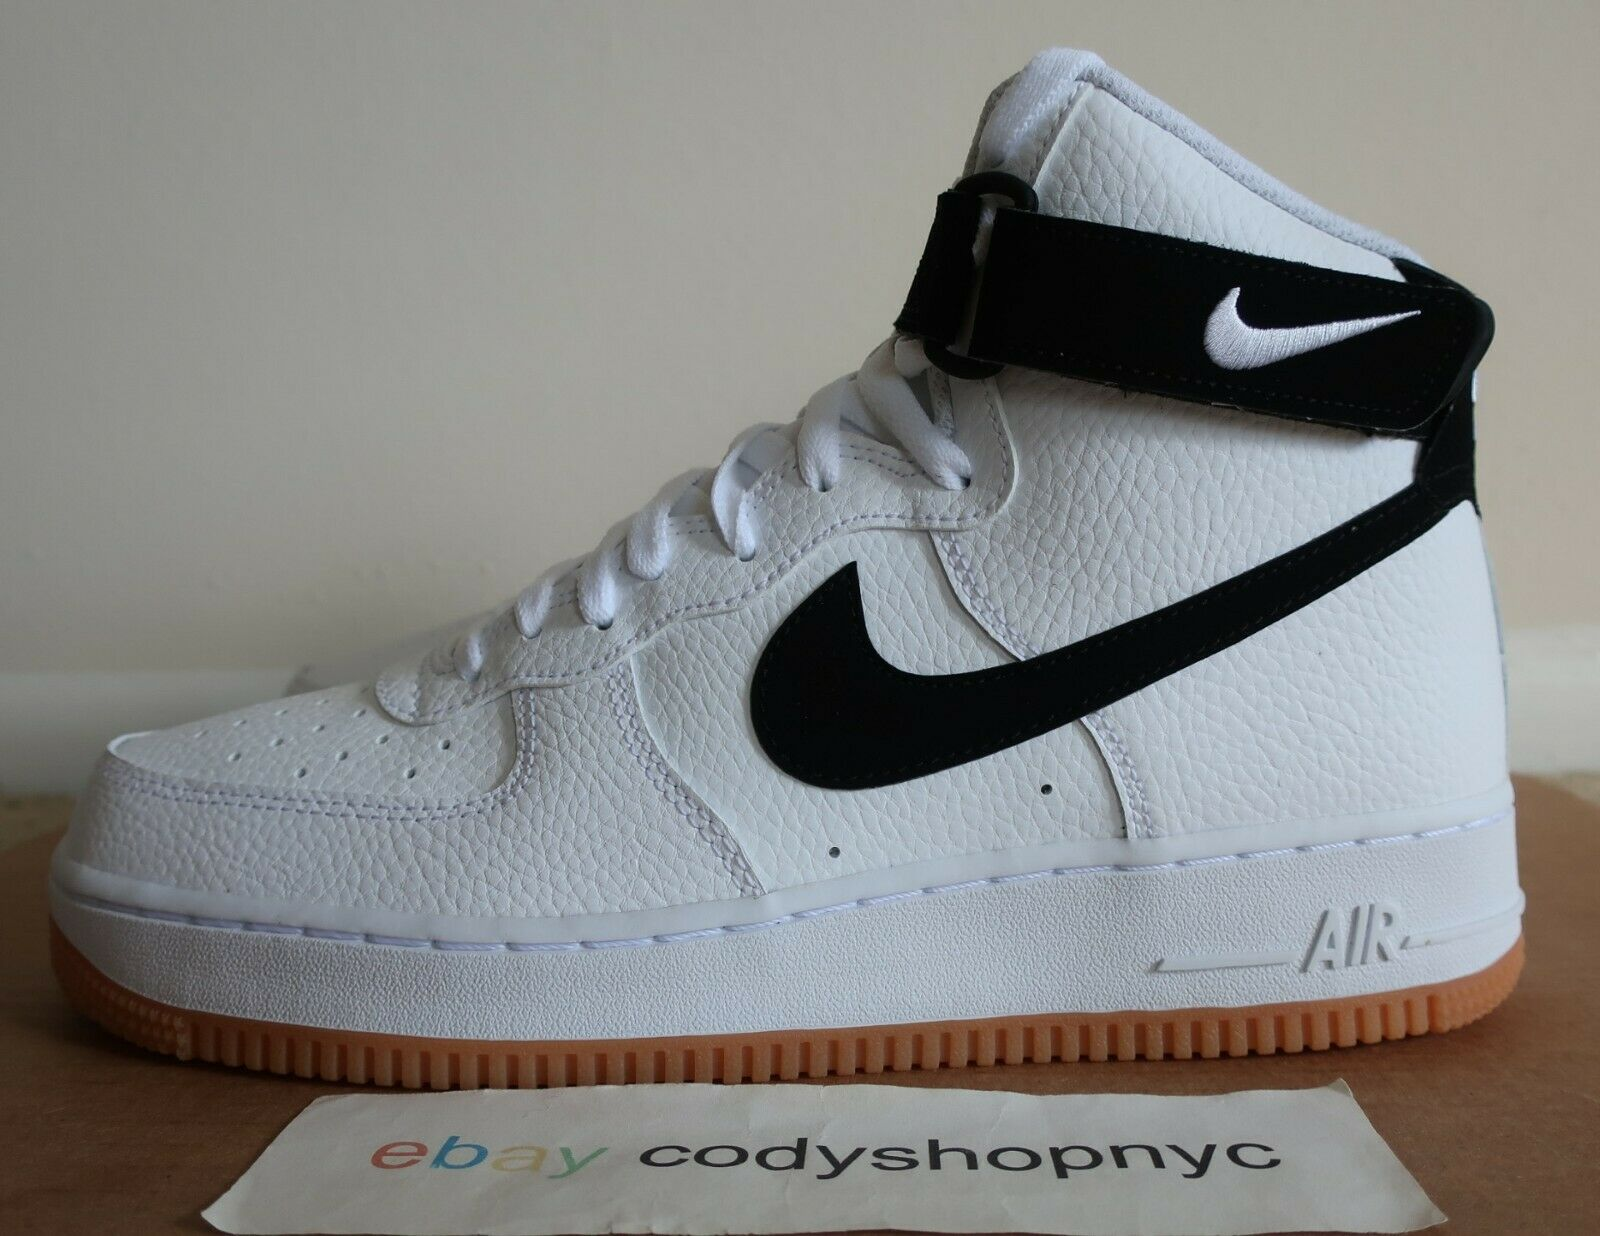 Nike Air Force 1 High 07 2 White Black Gum Bottom Mens At7653 100 Sz 11 For Sale Online Ebay